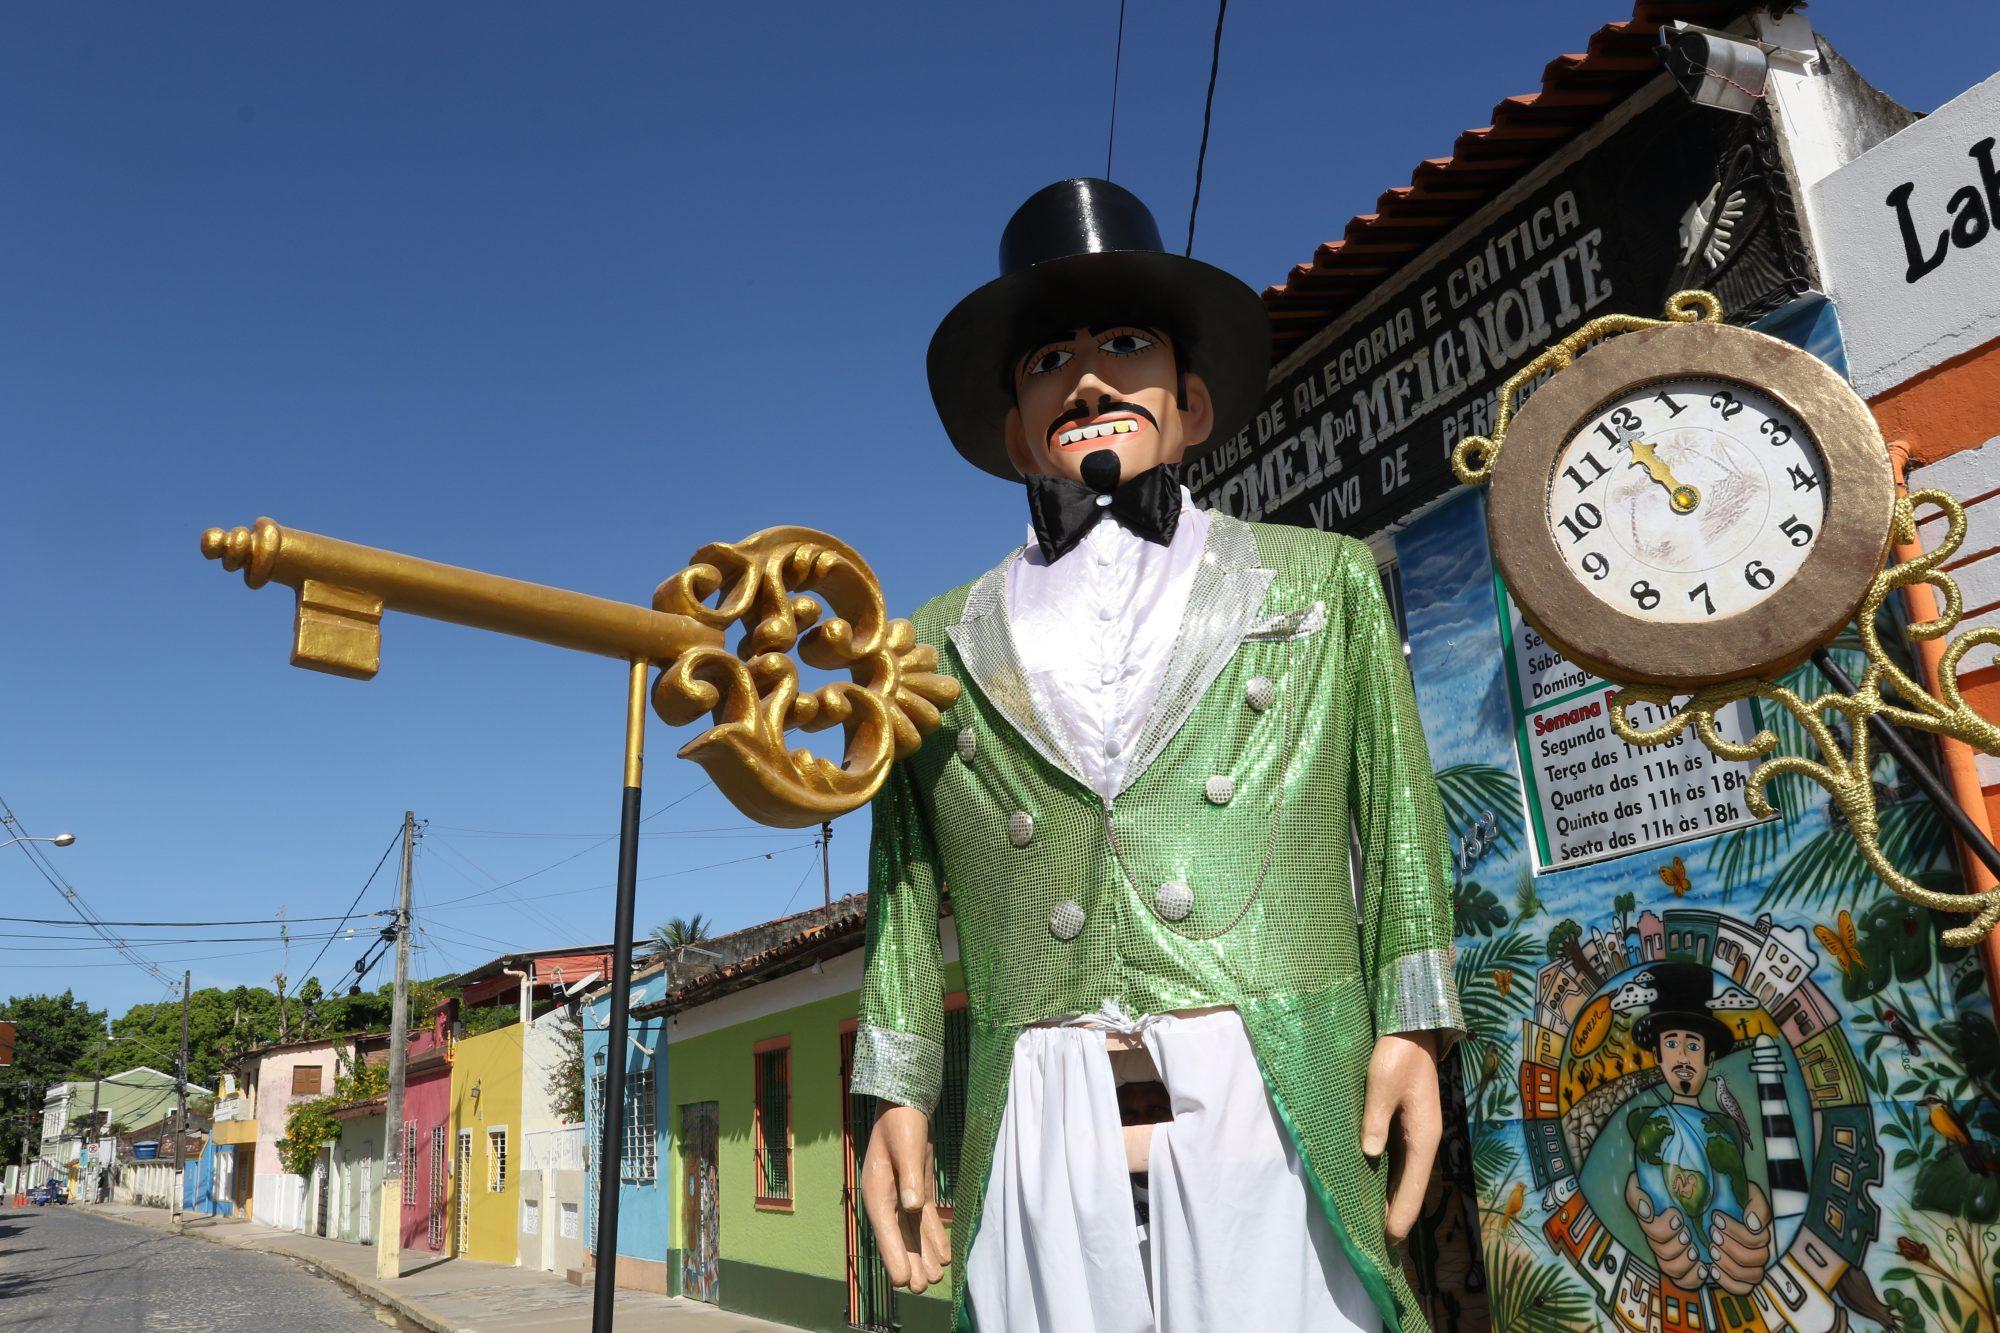 Cultura pernambucana estará presente no carnaval de Salvador